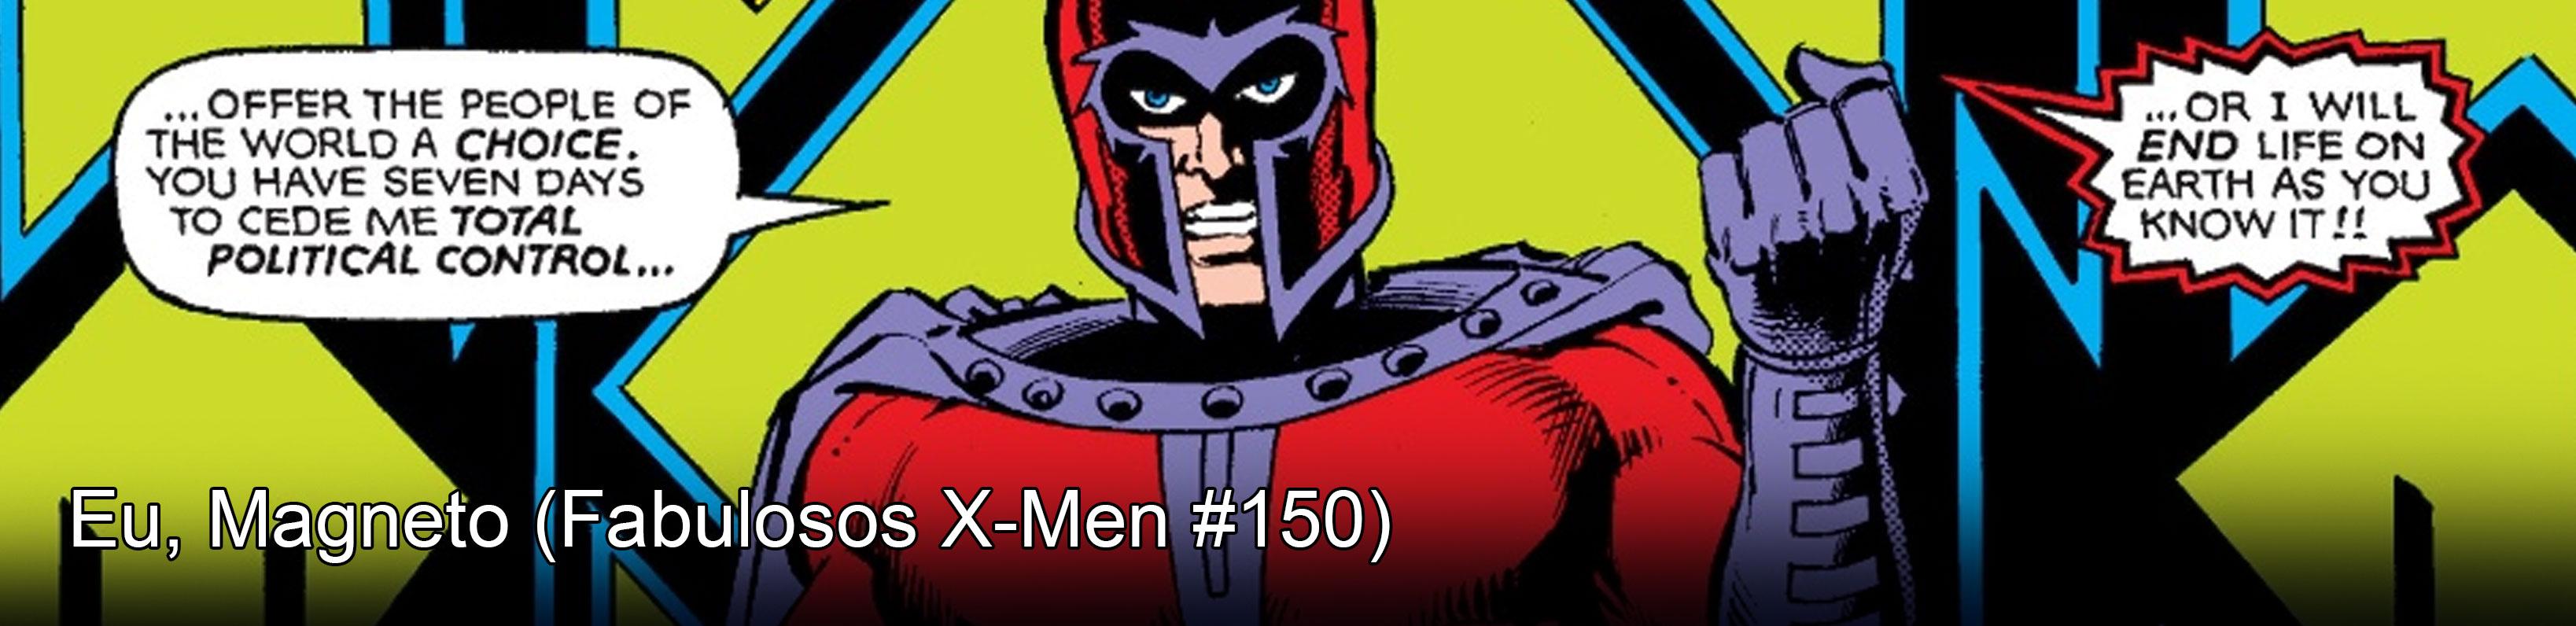 X-MEN COMPLEXO MESSIAS BAIXAR DE